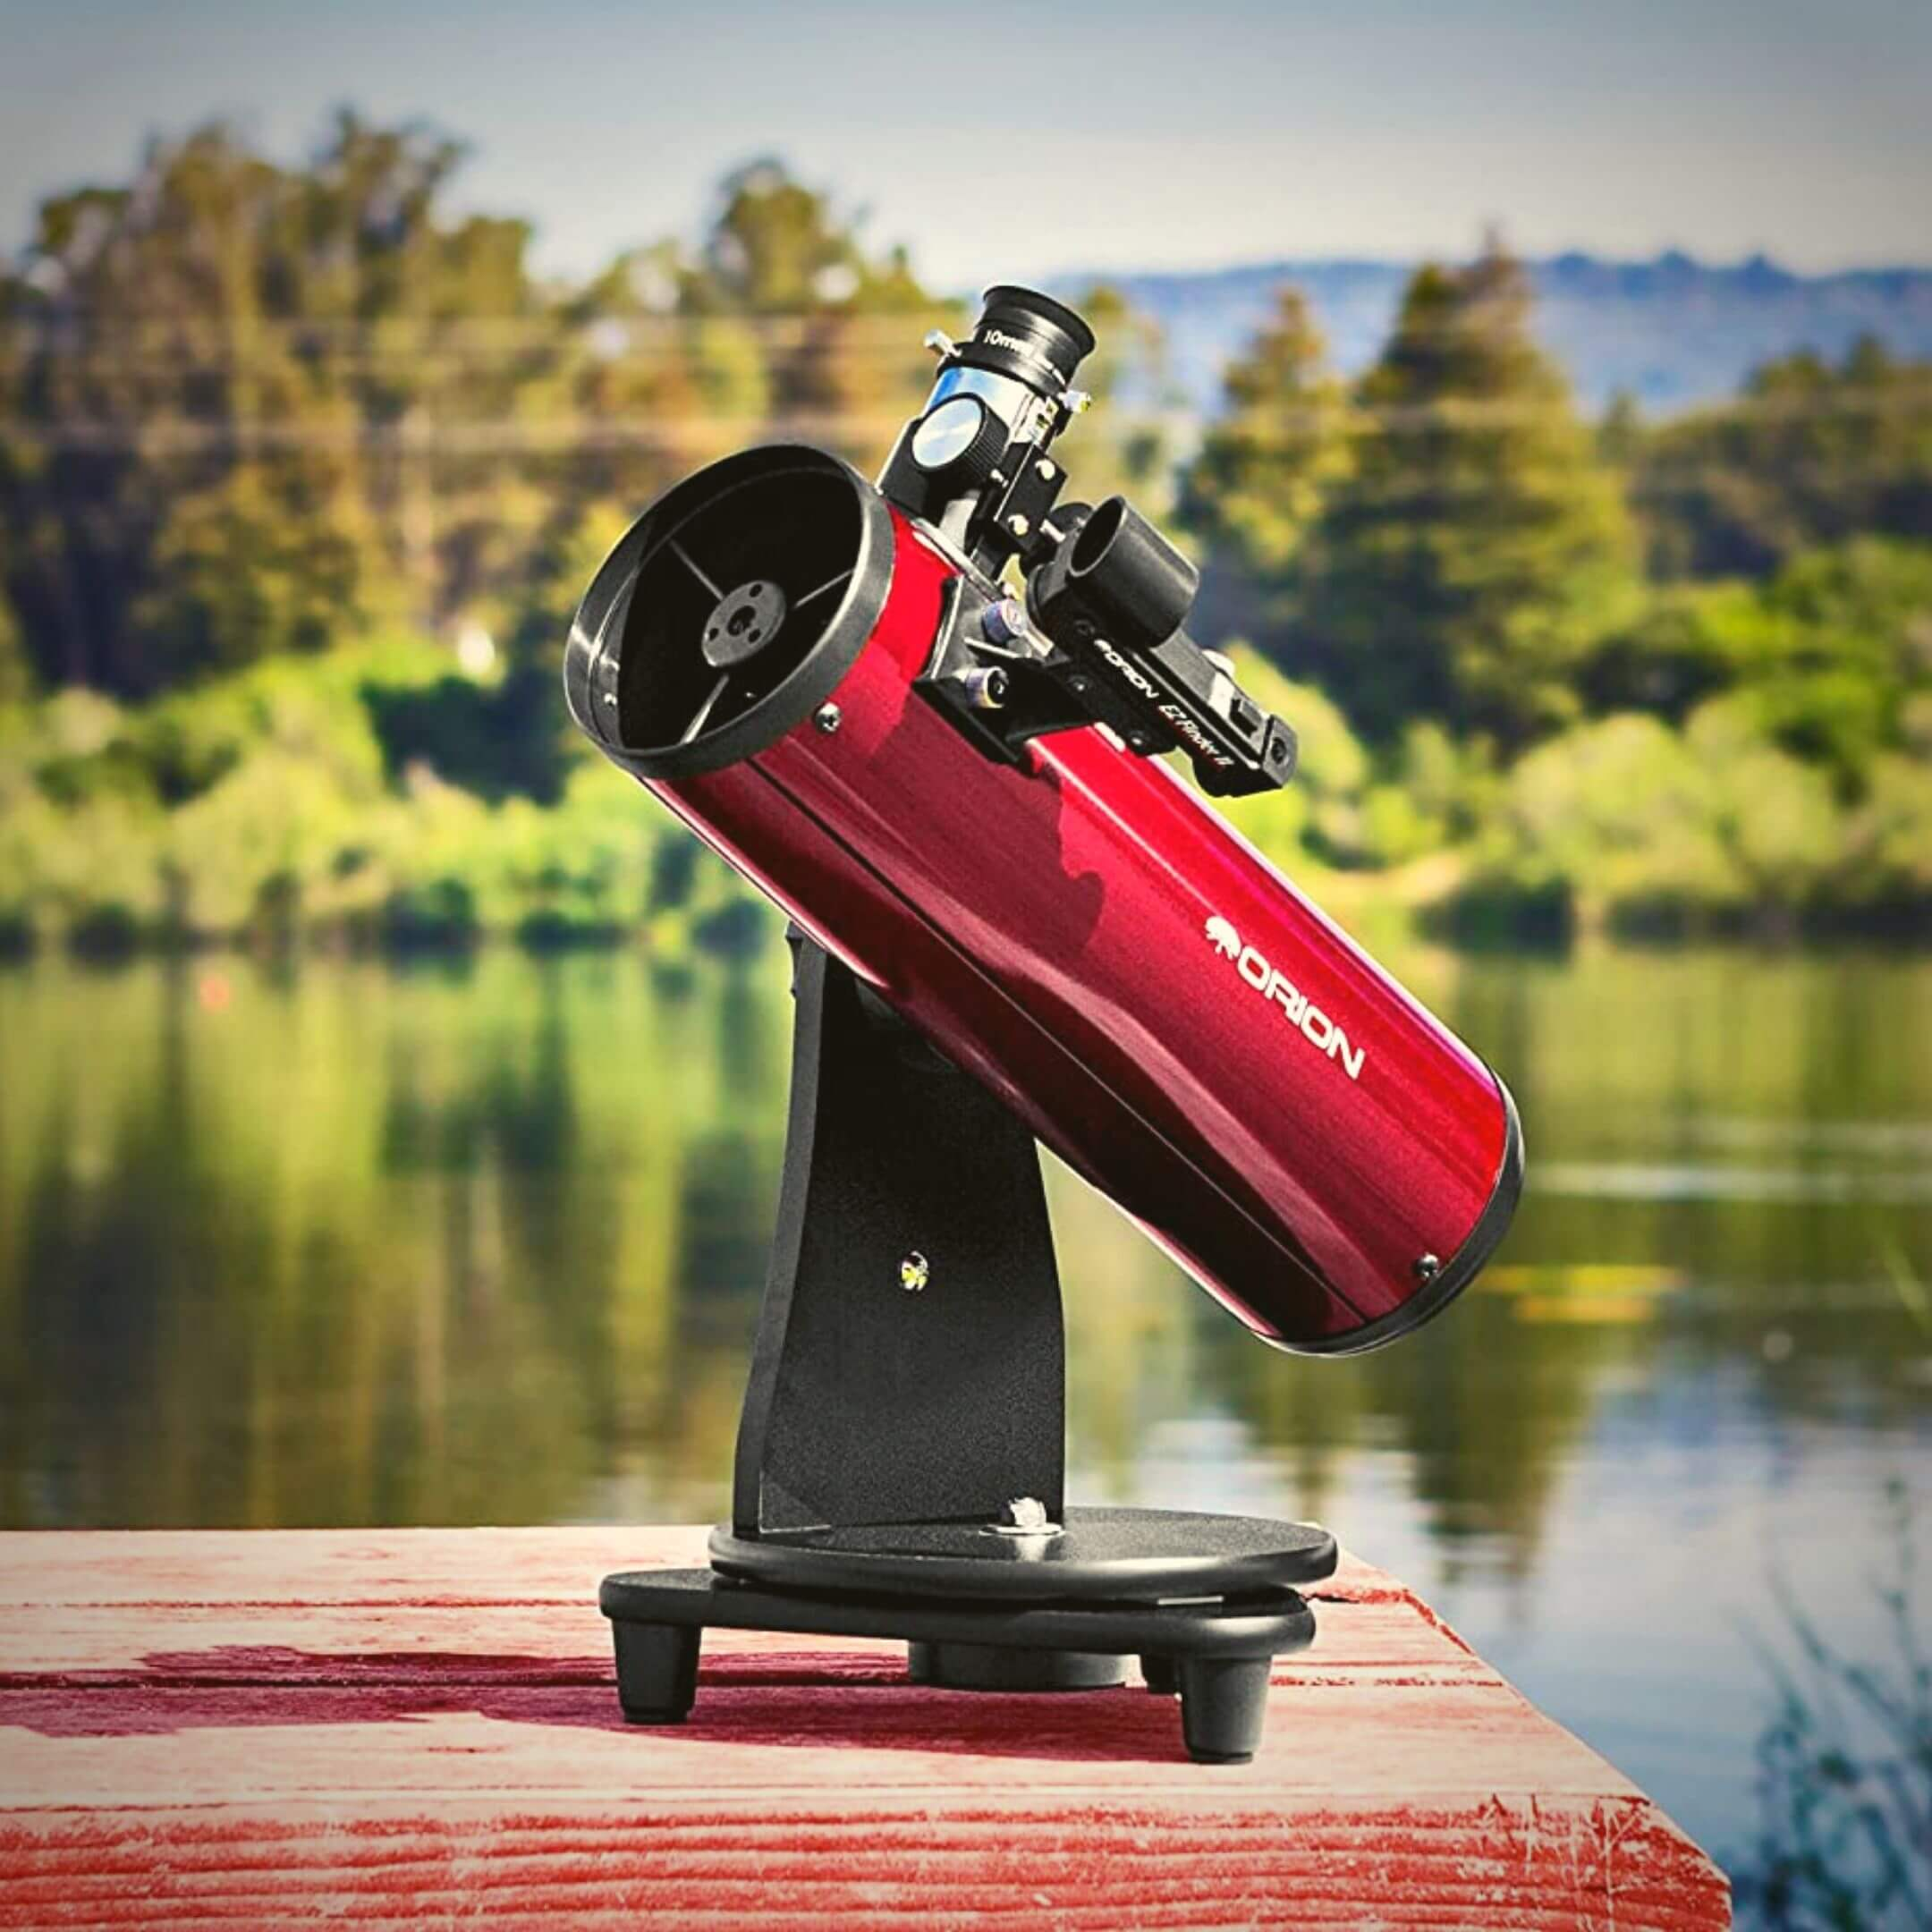 telescopio bueno de sobremesa orion